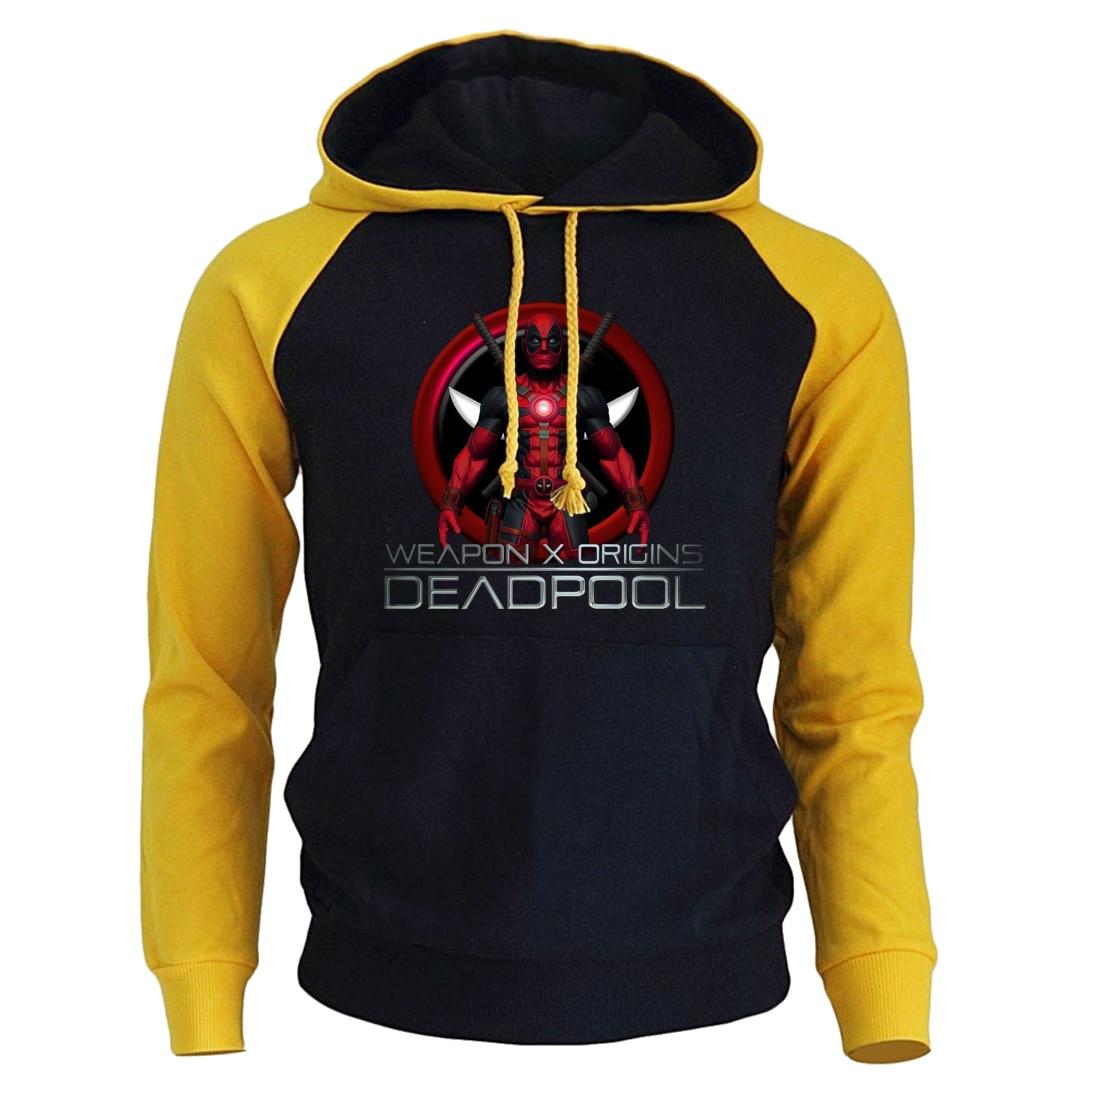 2019 New Fashion Raglan Sweatshirt For Men Spring Hooded Hoodies Print DEADPOOL Super Hero Men's Sweatshirts Harajuku Hoodie Top